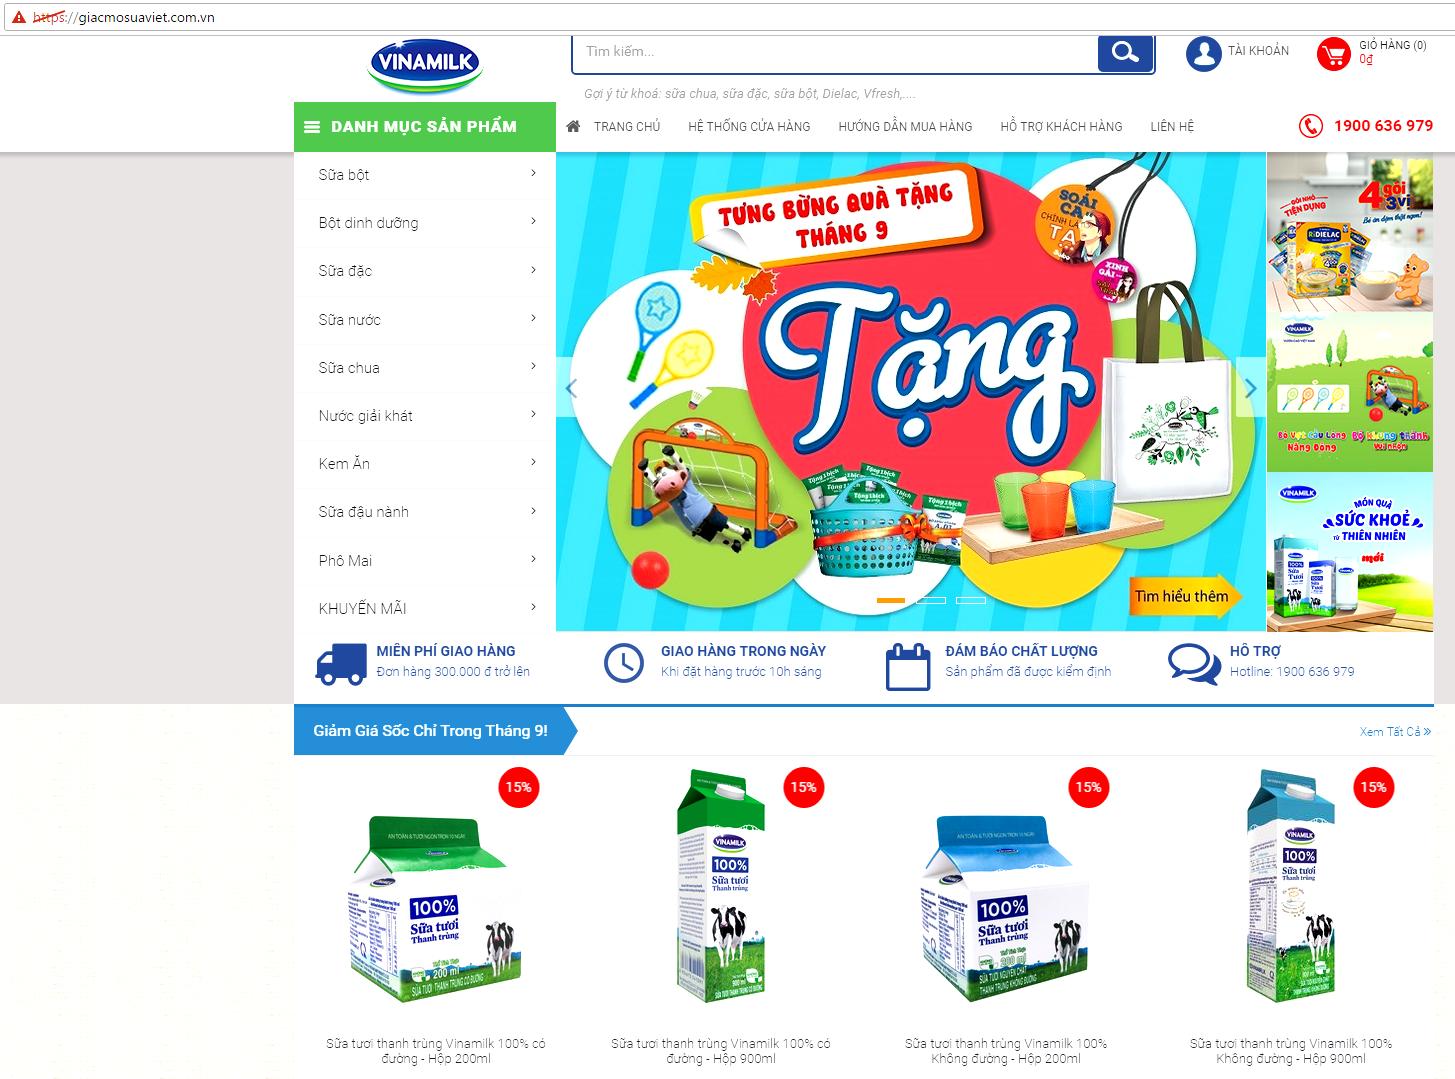 Vinamilk kinh doanh sữa online